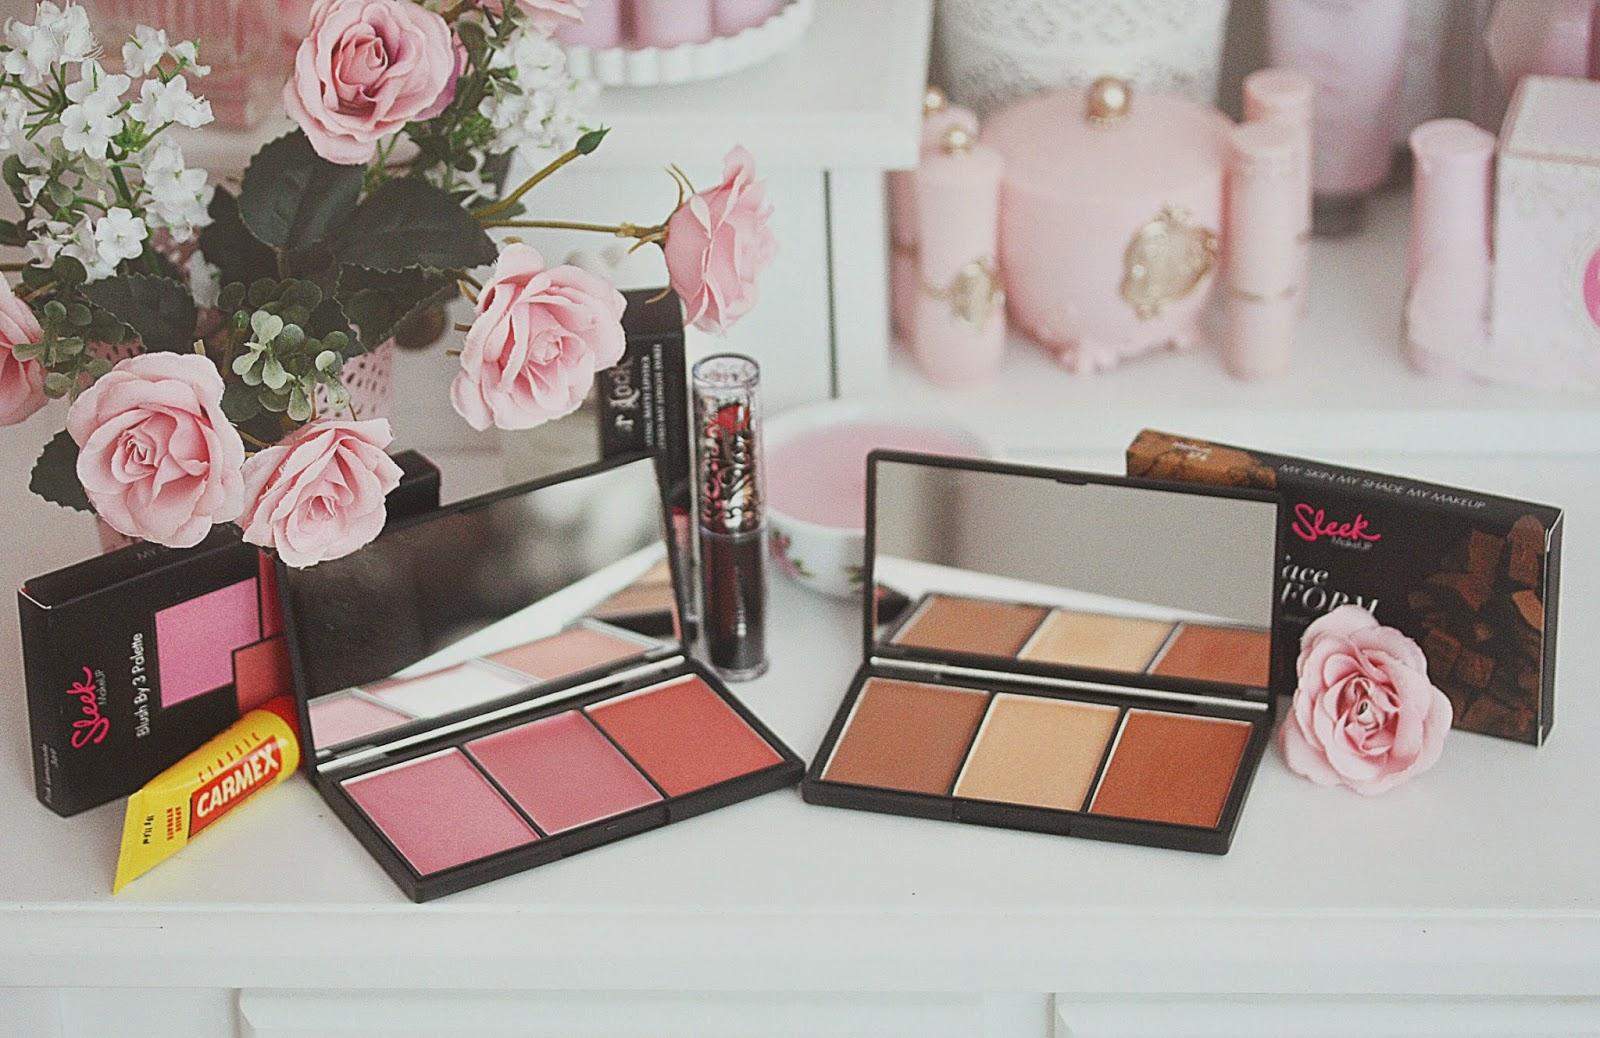 http://www.rosemademoiselle.com/2015/04/my-sweet-makeup.html